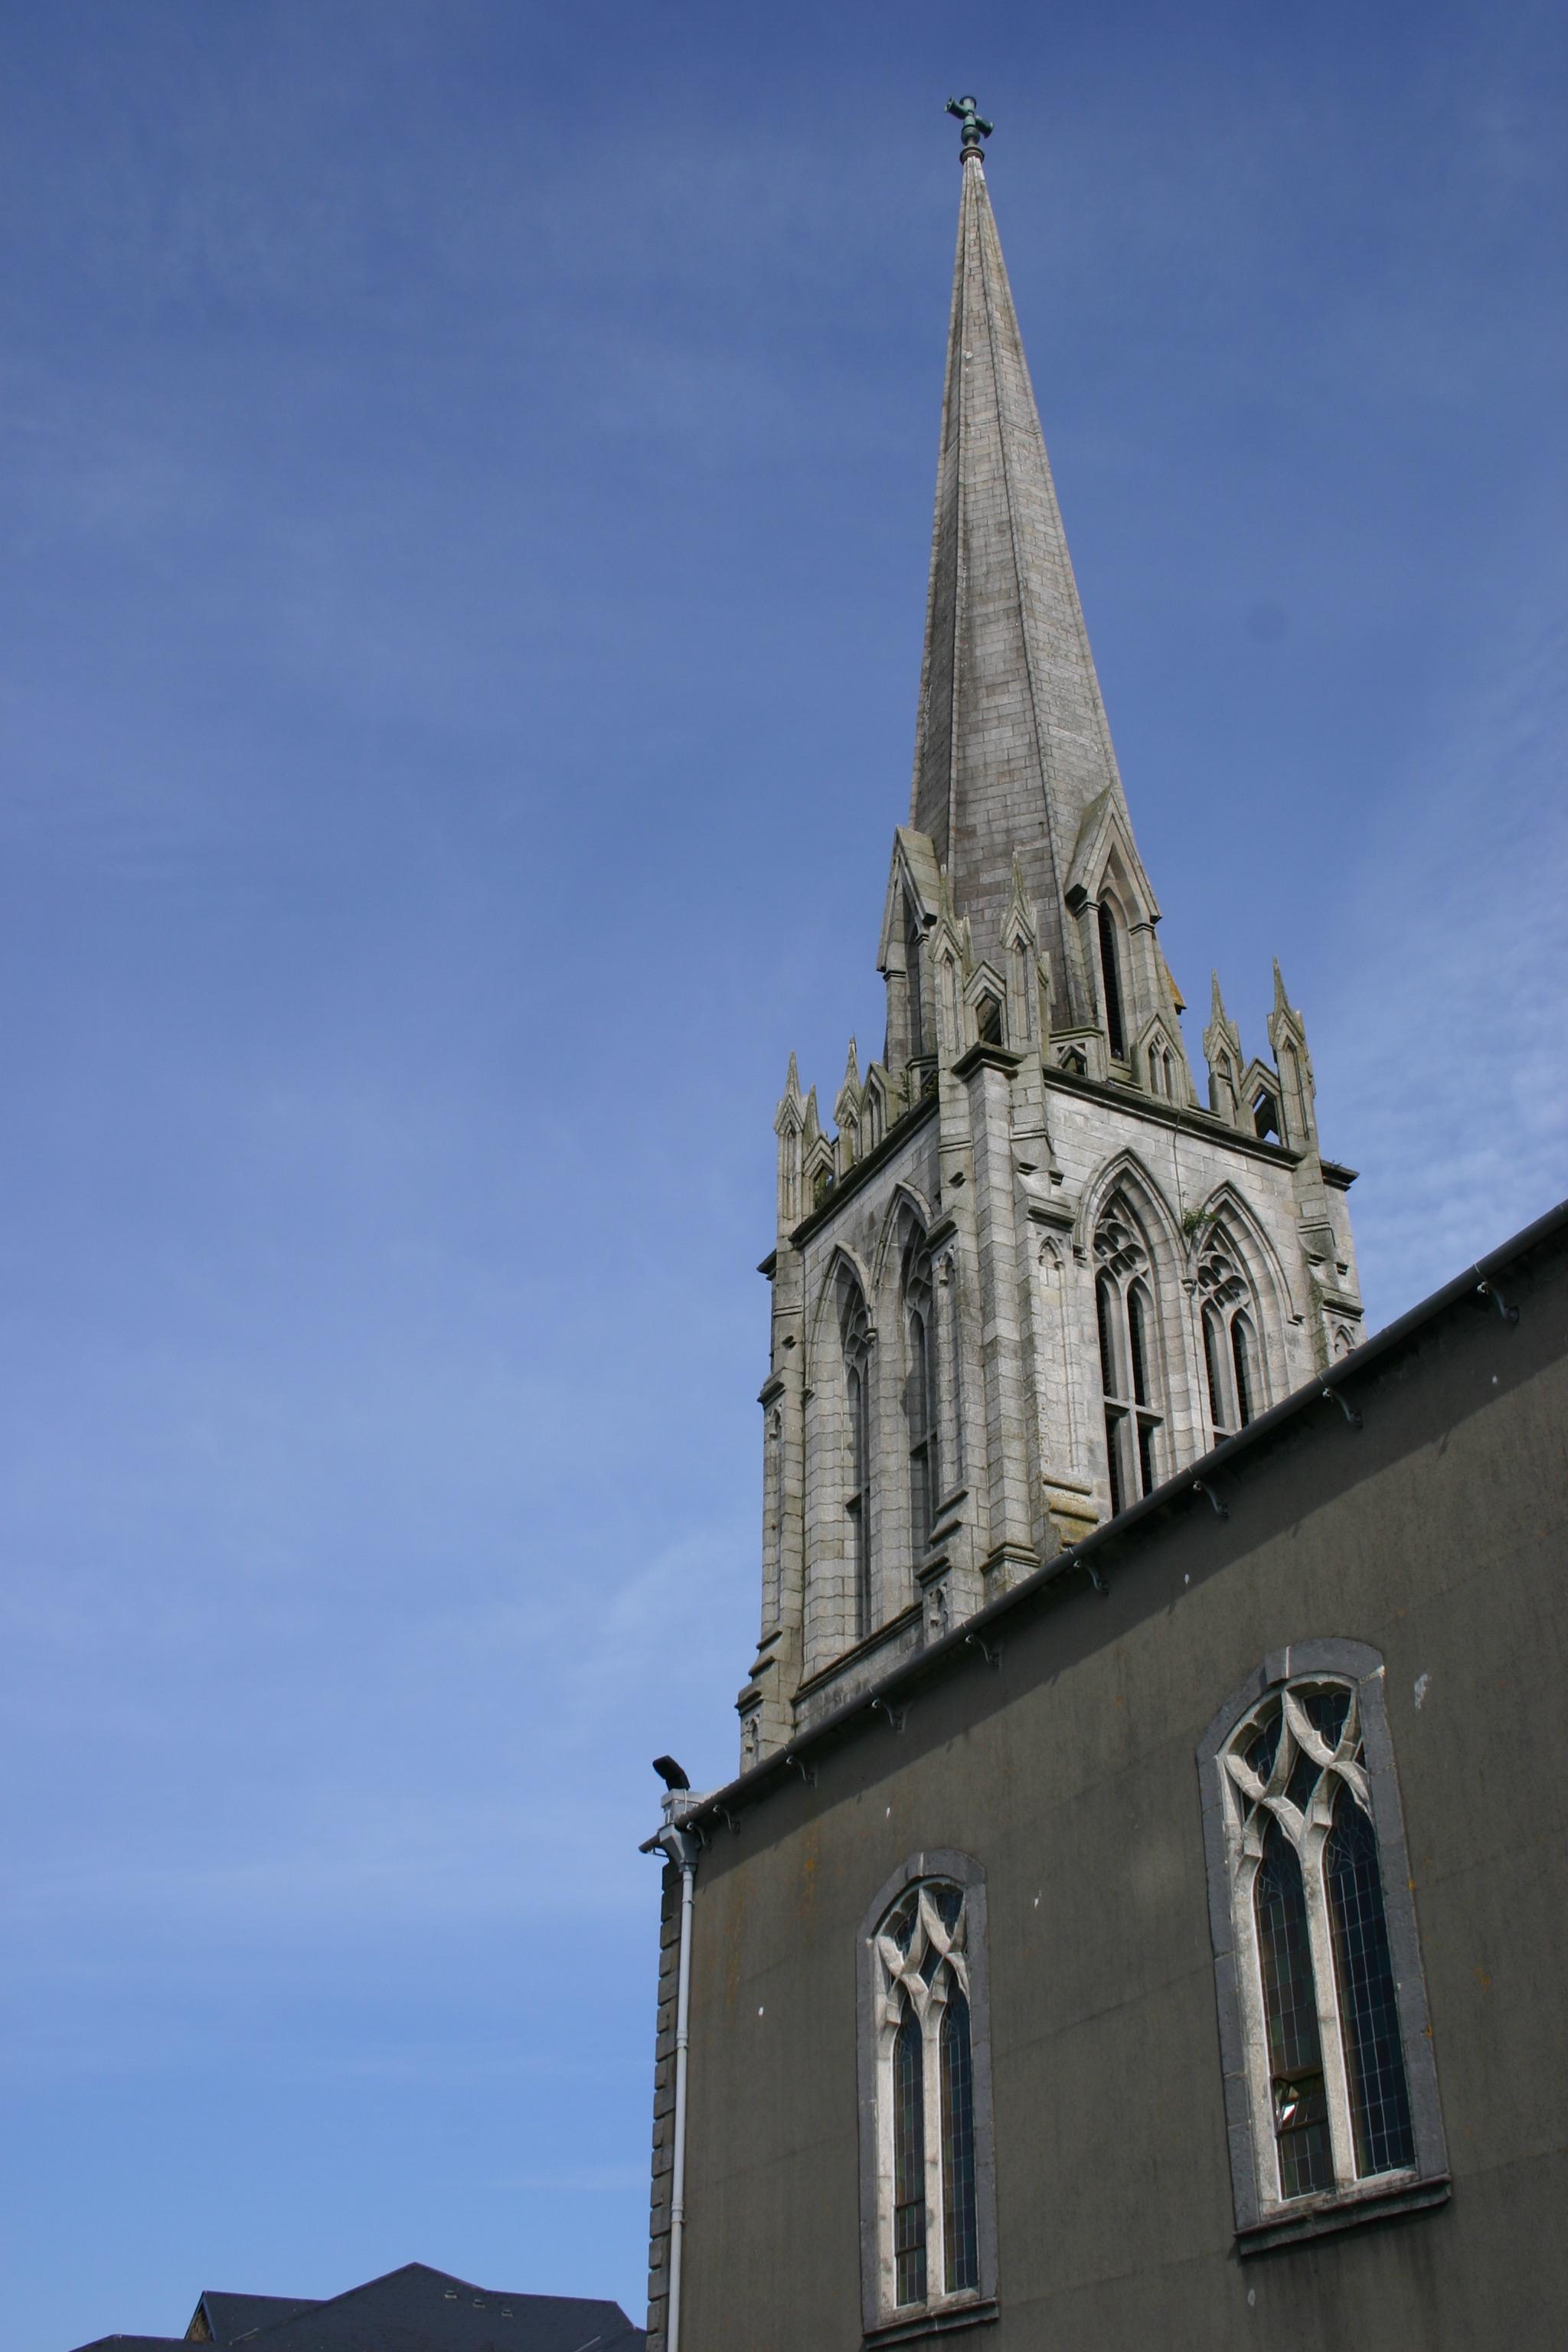 church of irelland carlow.jpg